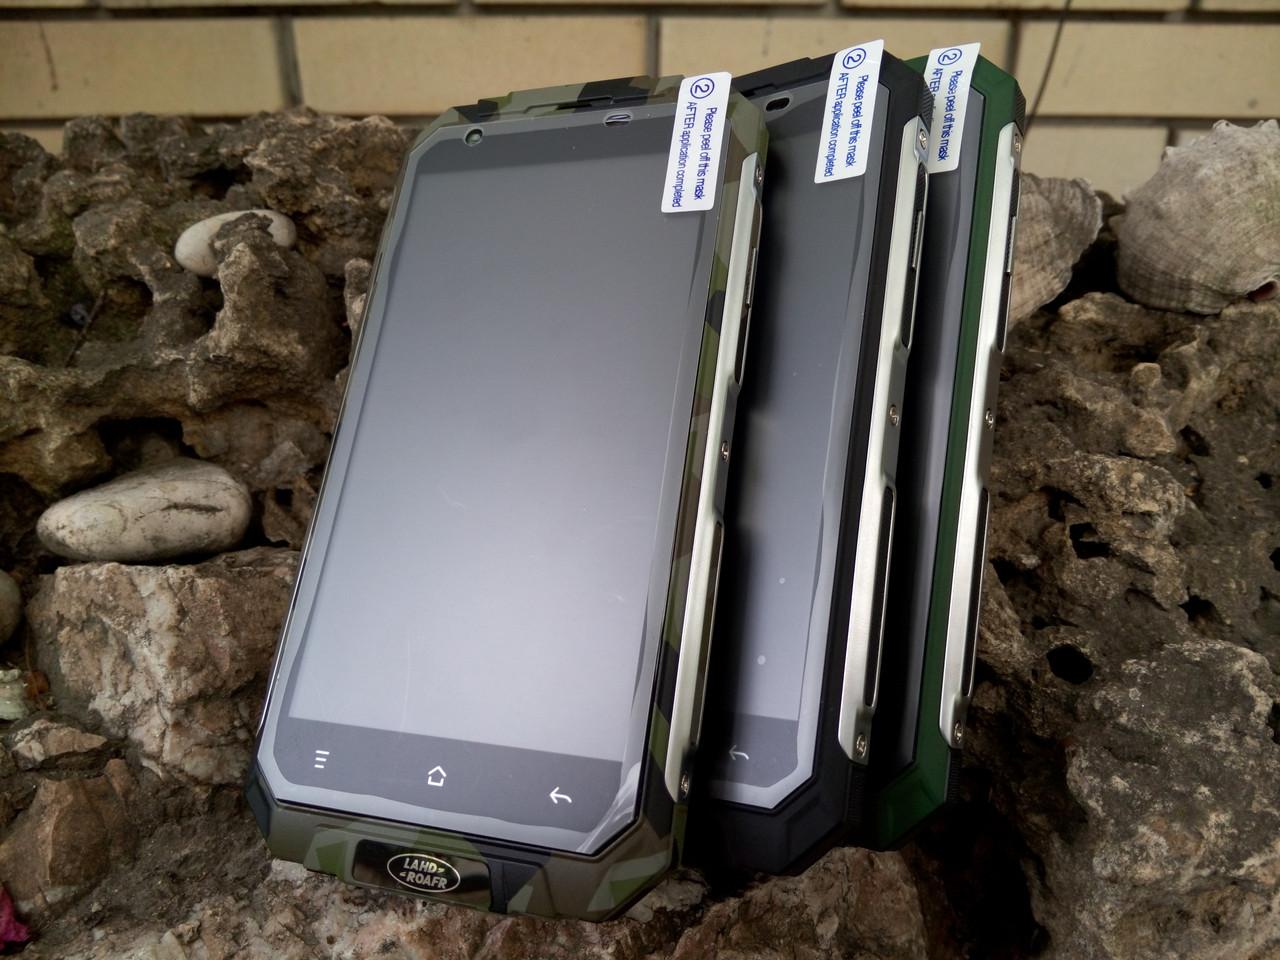 2d6568729650b Защищенный смартфон Land rover V9+ 10000мАч Black - Rov-mobile, защищённые  смартфоны и телефоны